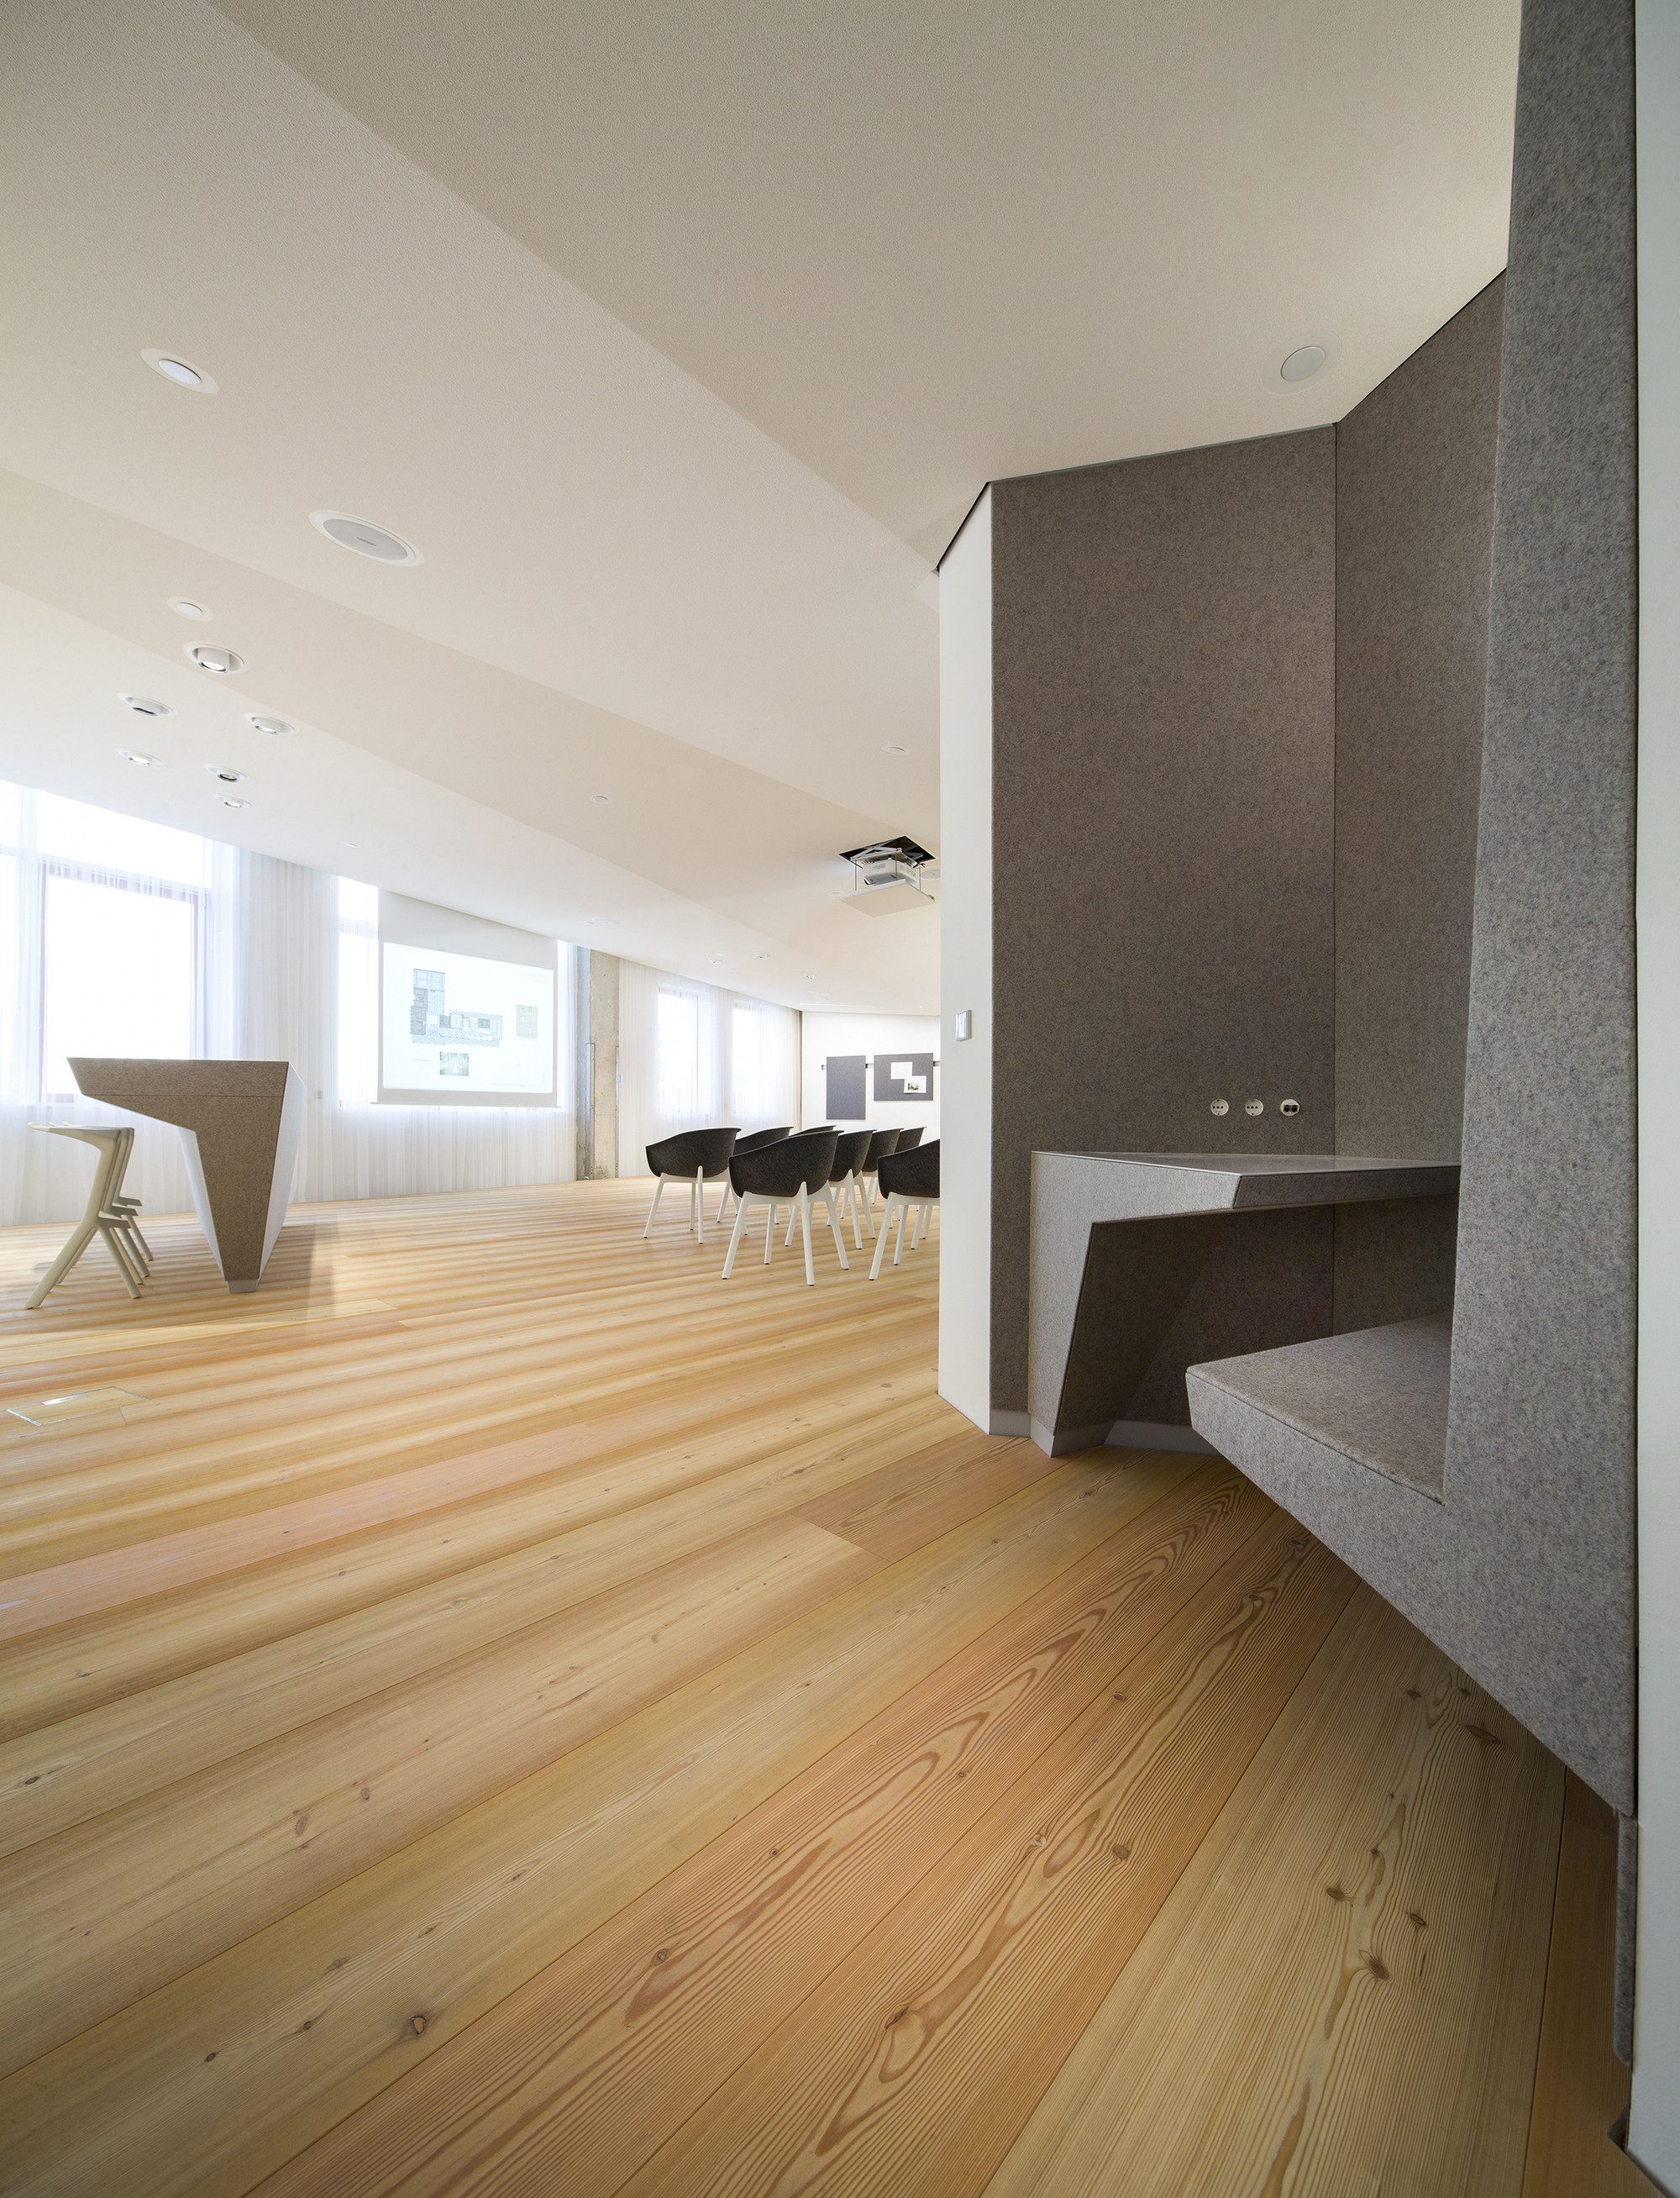 gallery of kreativlabs sch ne r ume architektur. Black Bedroom Furniture Sets. Home Design Ideas